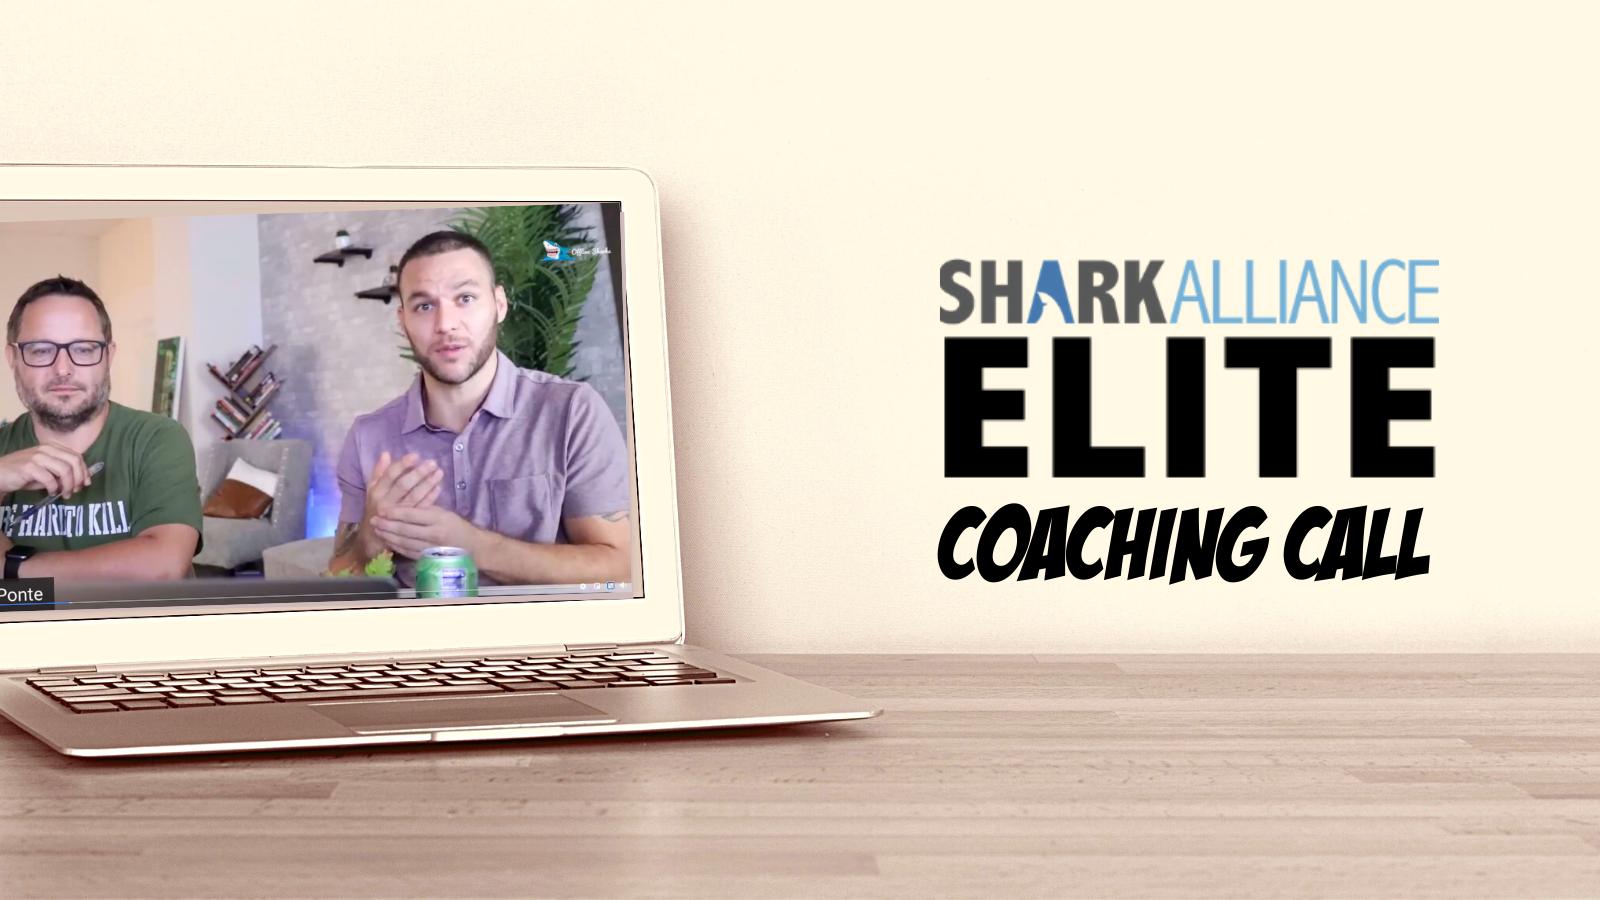 Shark Alliance Elite Coaching Call 3